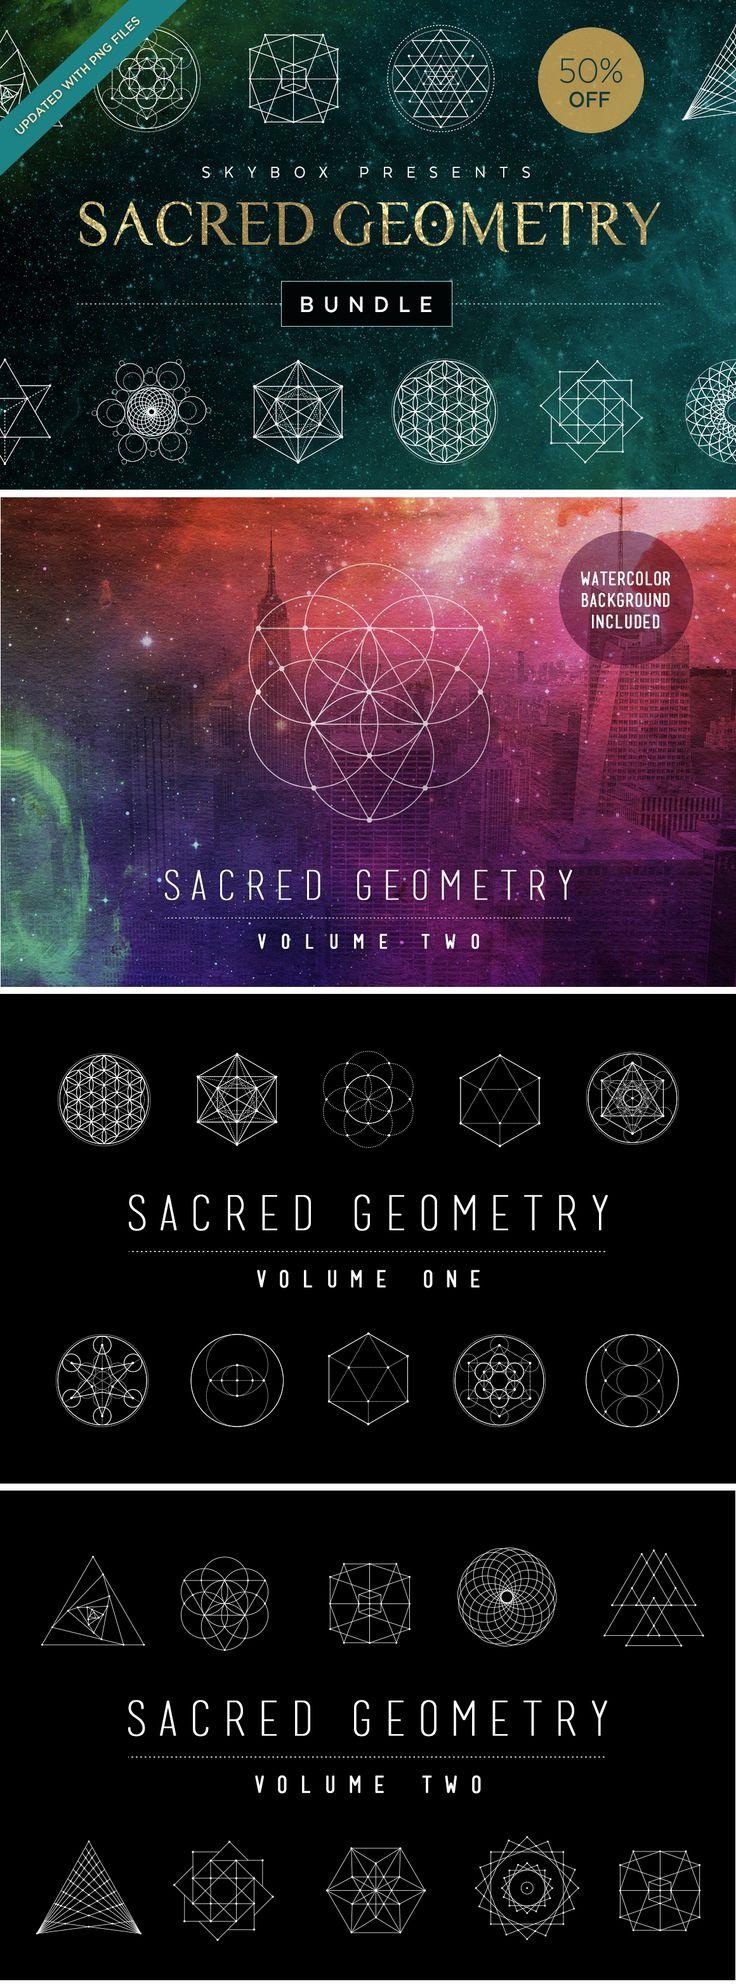 Sacred Geometry Bundle by skyboxcreative on Creative Market